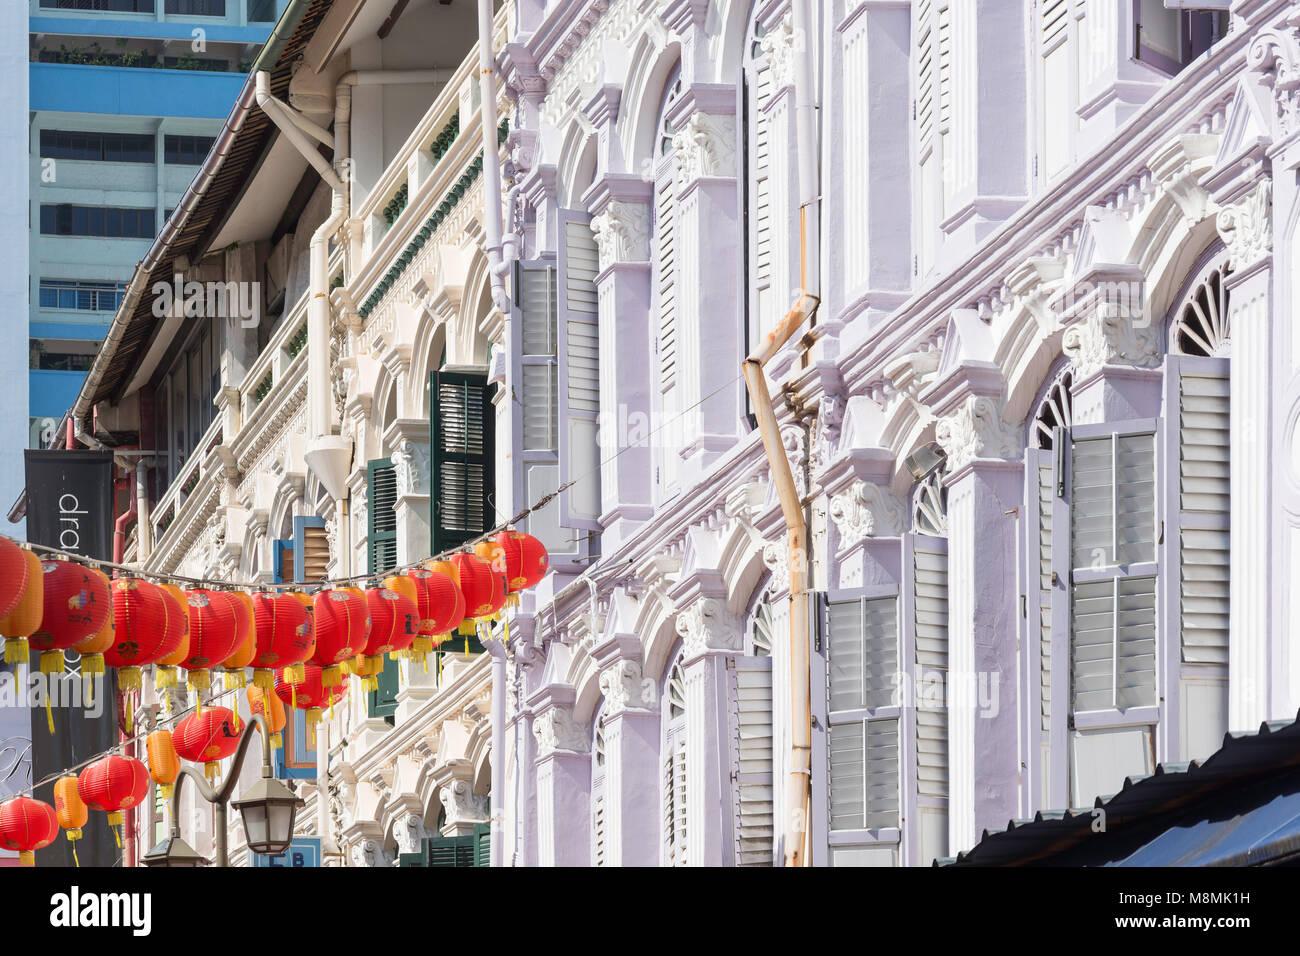 Shophouses, Pagoda Street, Chinatown, Outram District, Central Area, Singapore Island (Pulau Ujong), Singapore - Stock Image